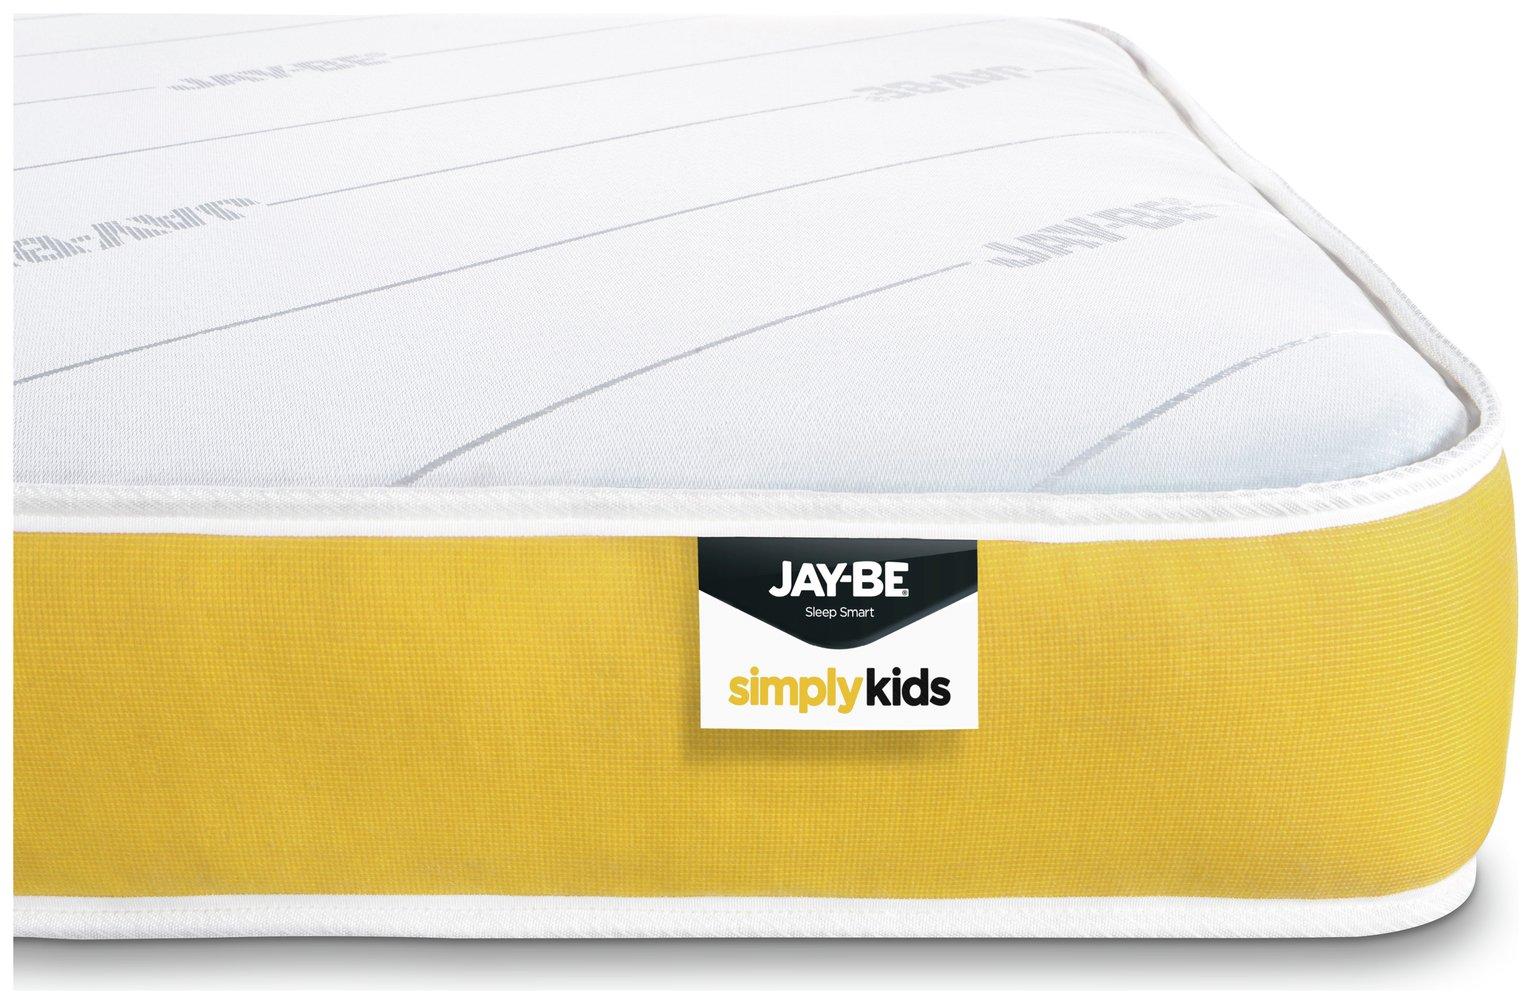 JAY-BE Pocket Sprung Kids Single Mattress at Argos review